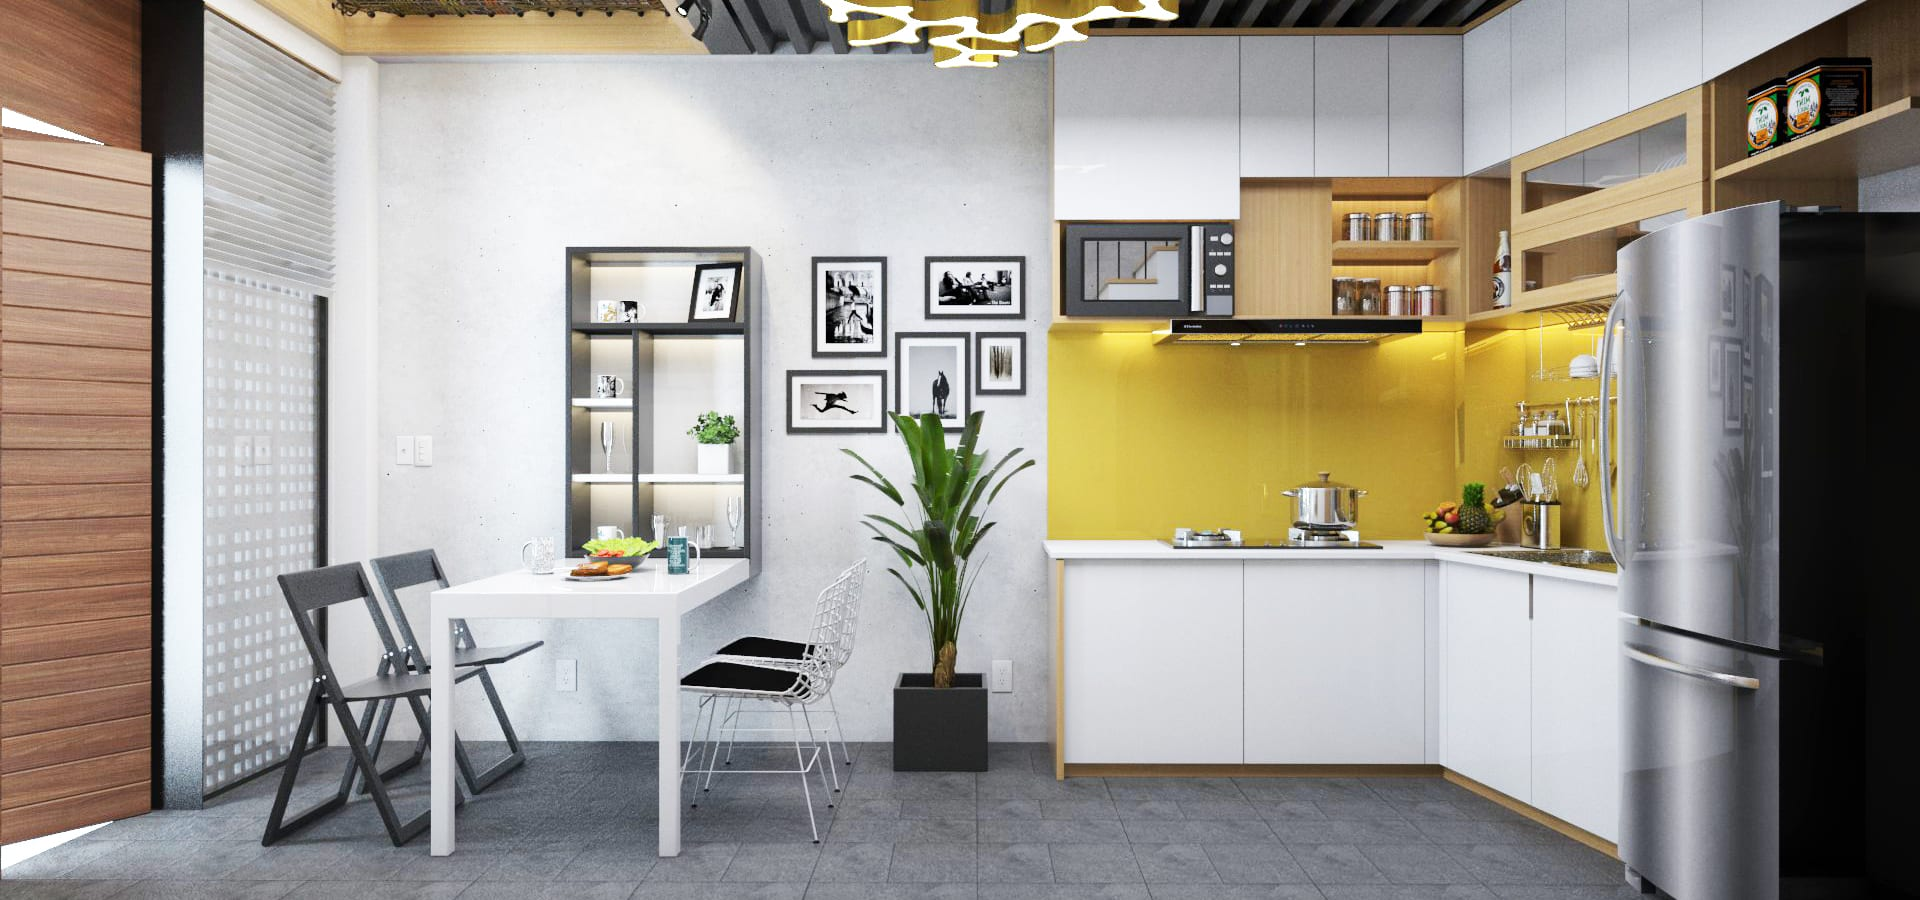 MEG Design Studio